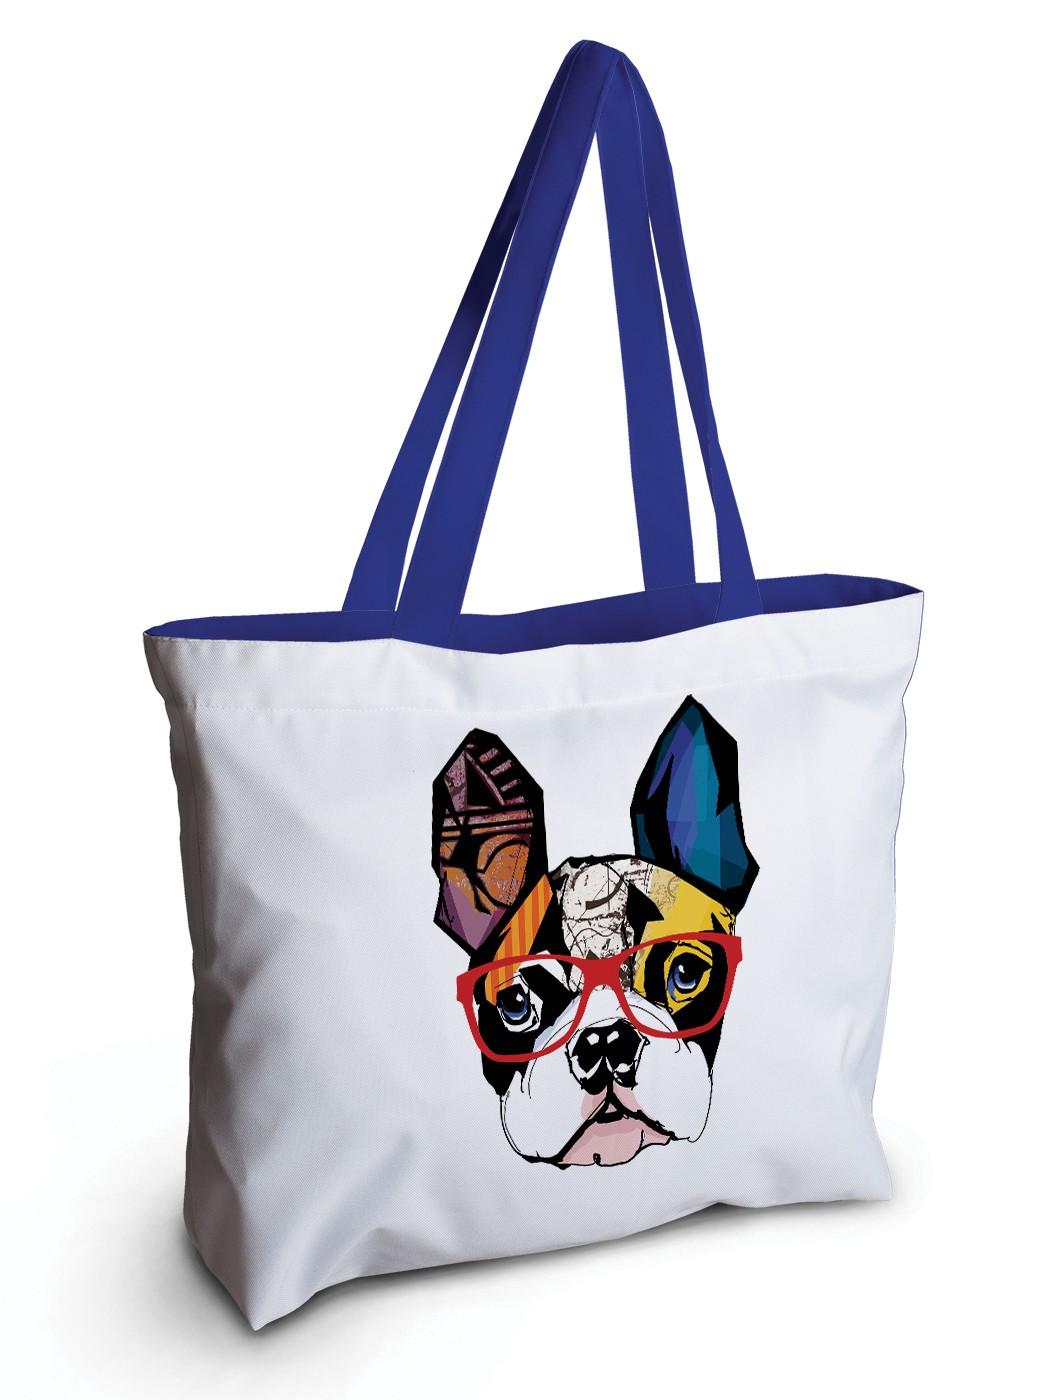 Спортивная сумка JoyArty bsz_58154 геометрический мопс